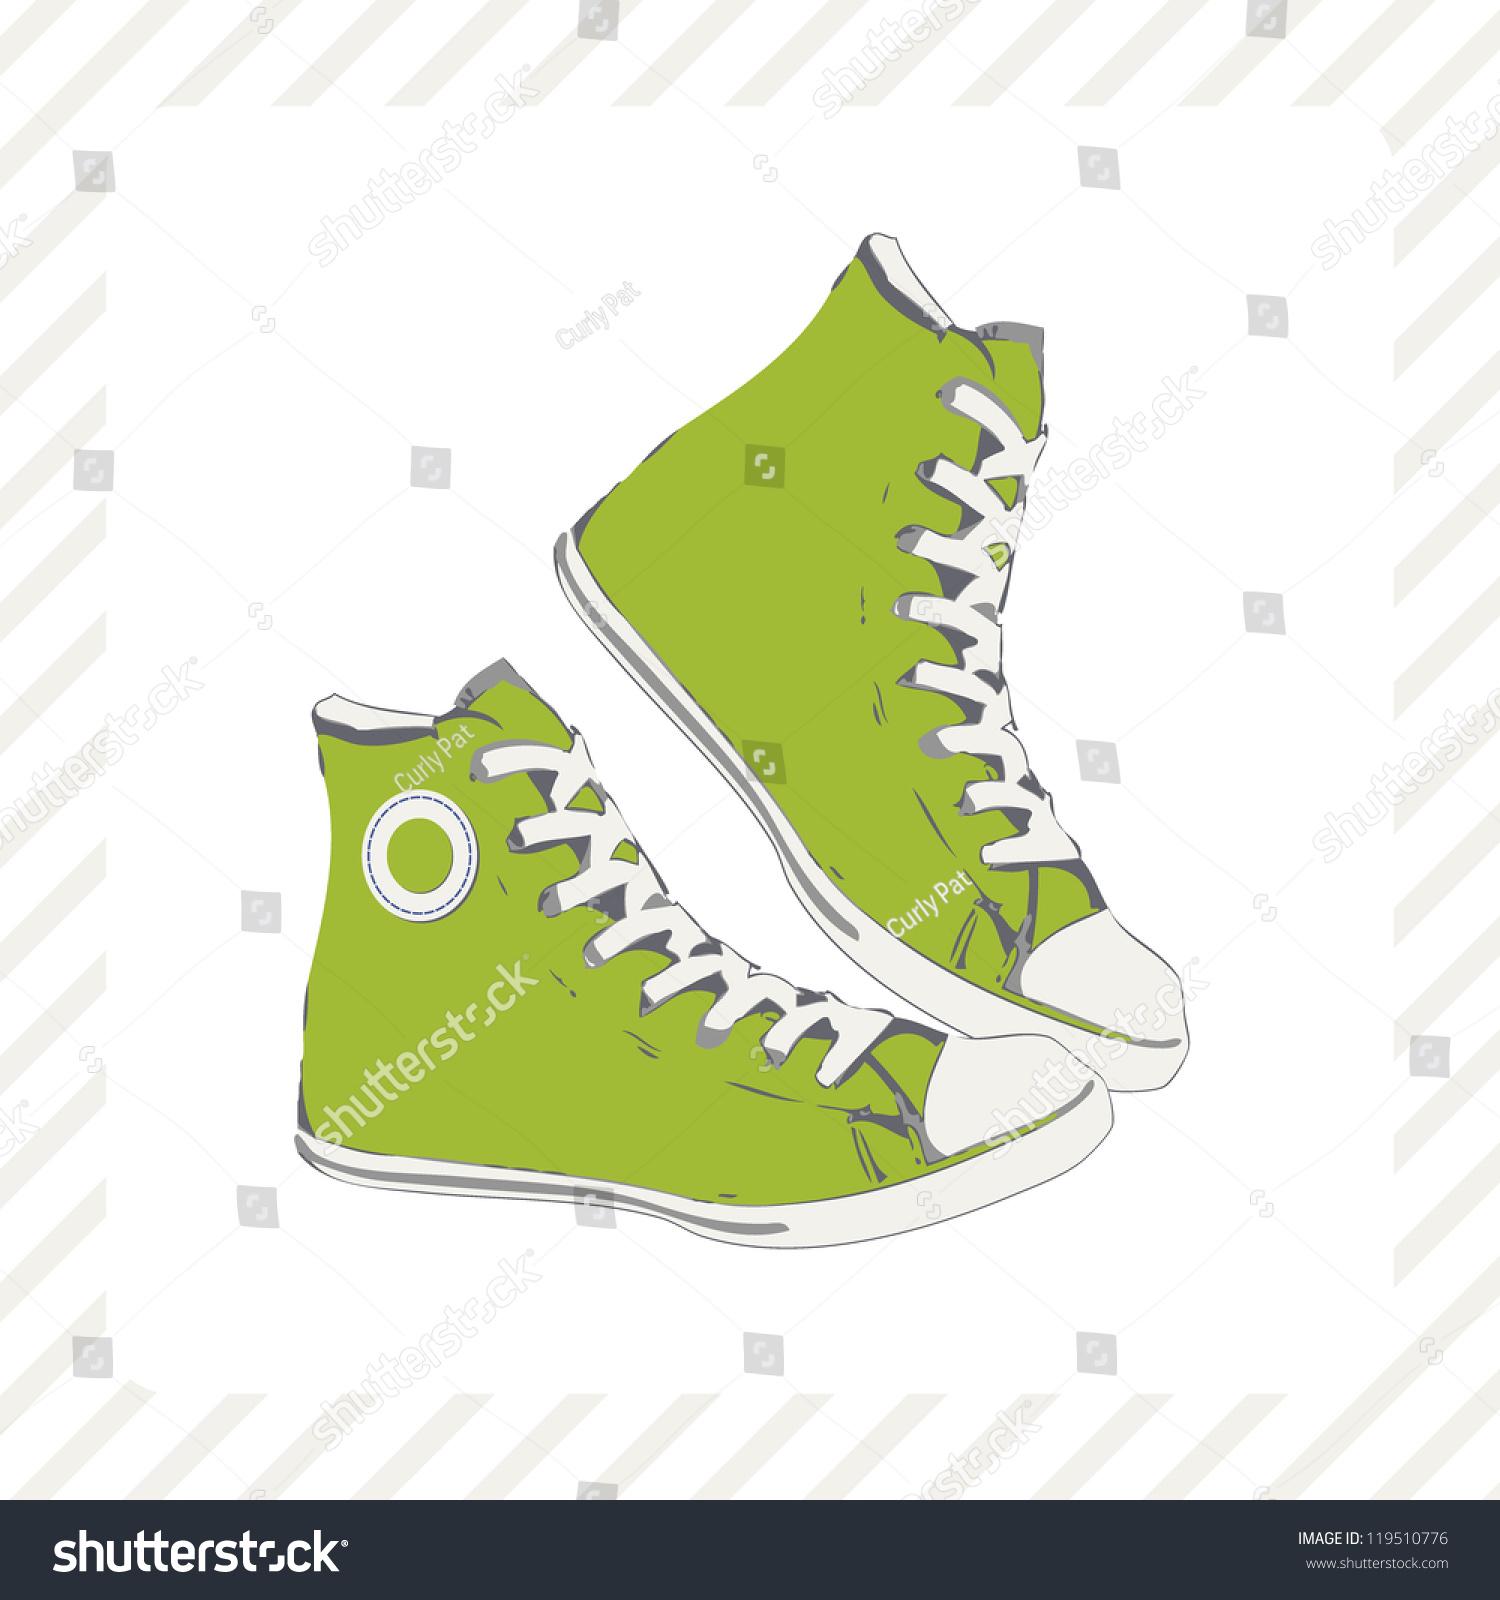 High Green Sneaker Side View Gumshoe Stock Vector 119510776